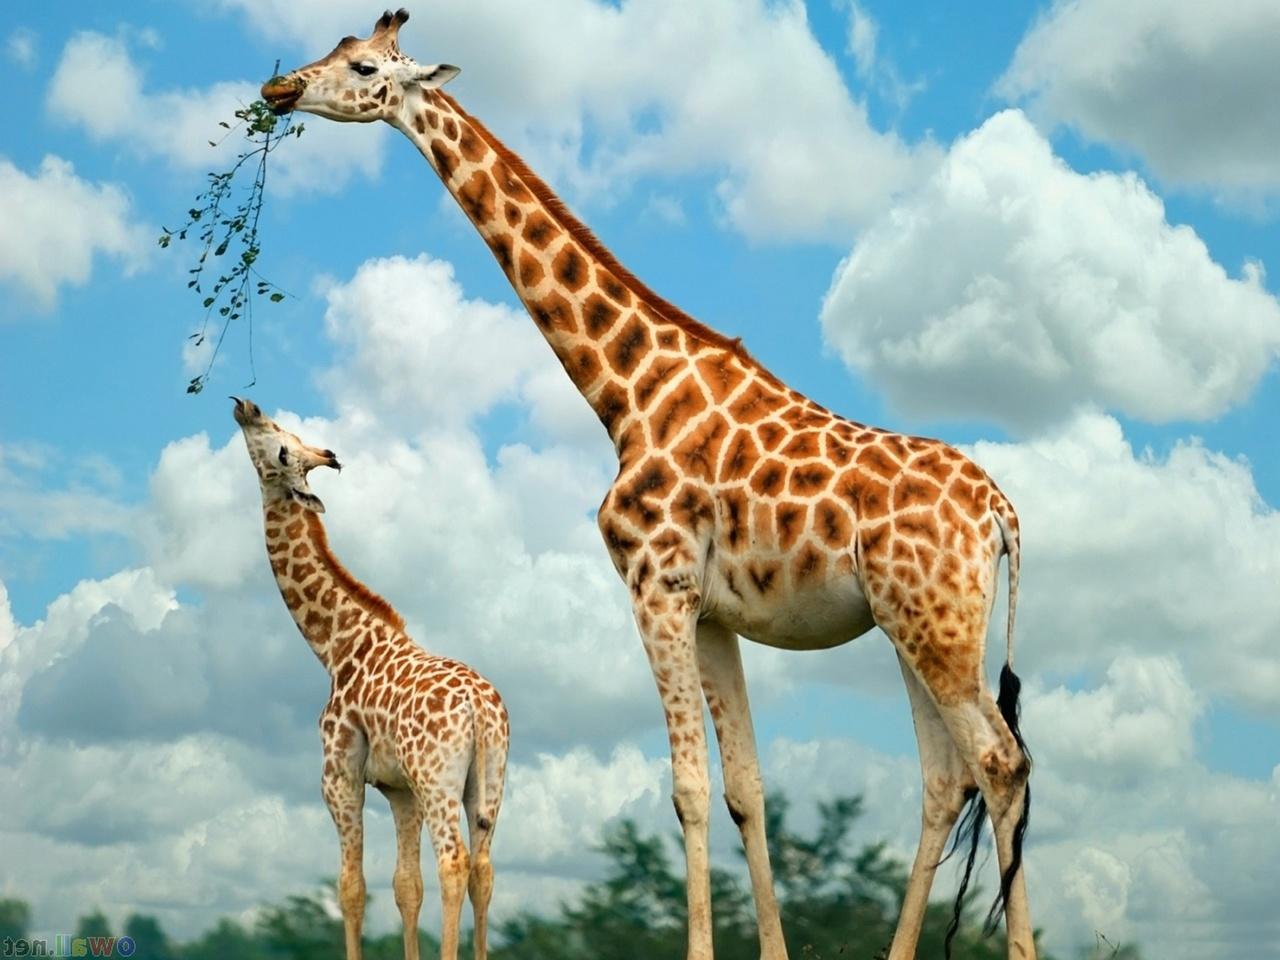 Baby Giraffe Tongu HD Wallpaper Background Images 1280x960